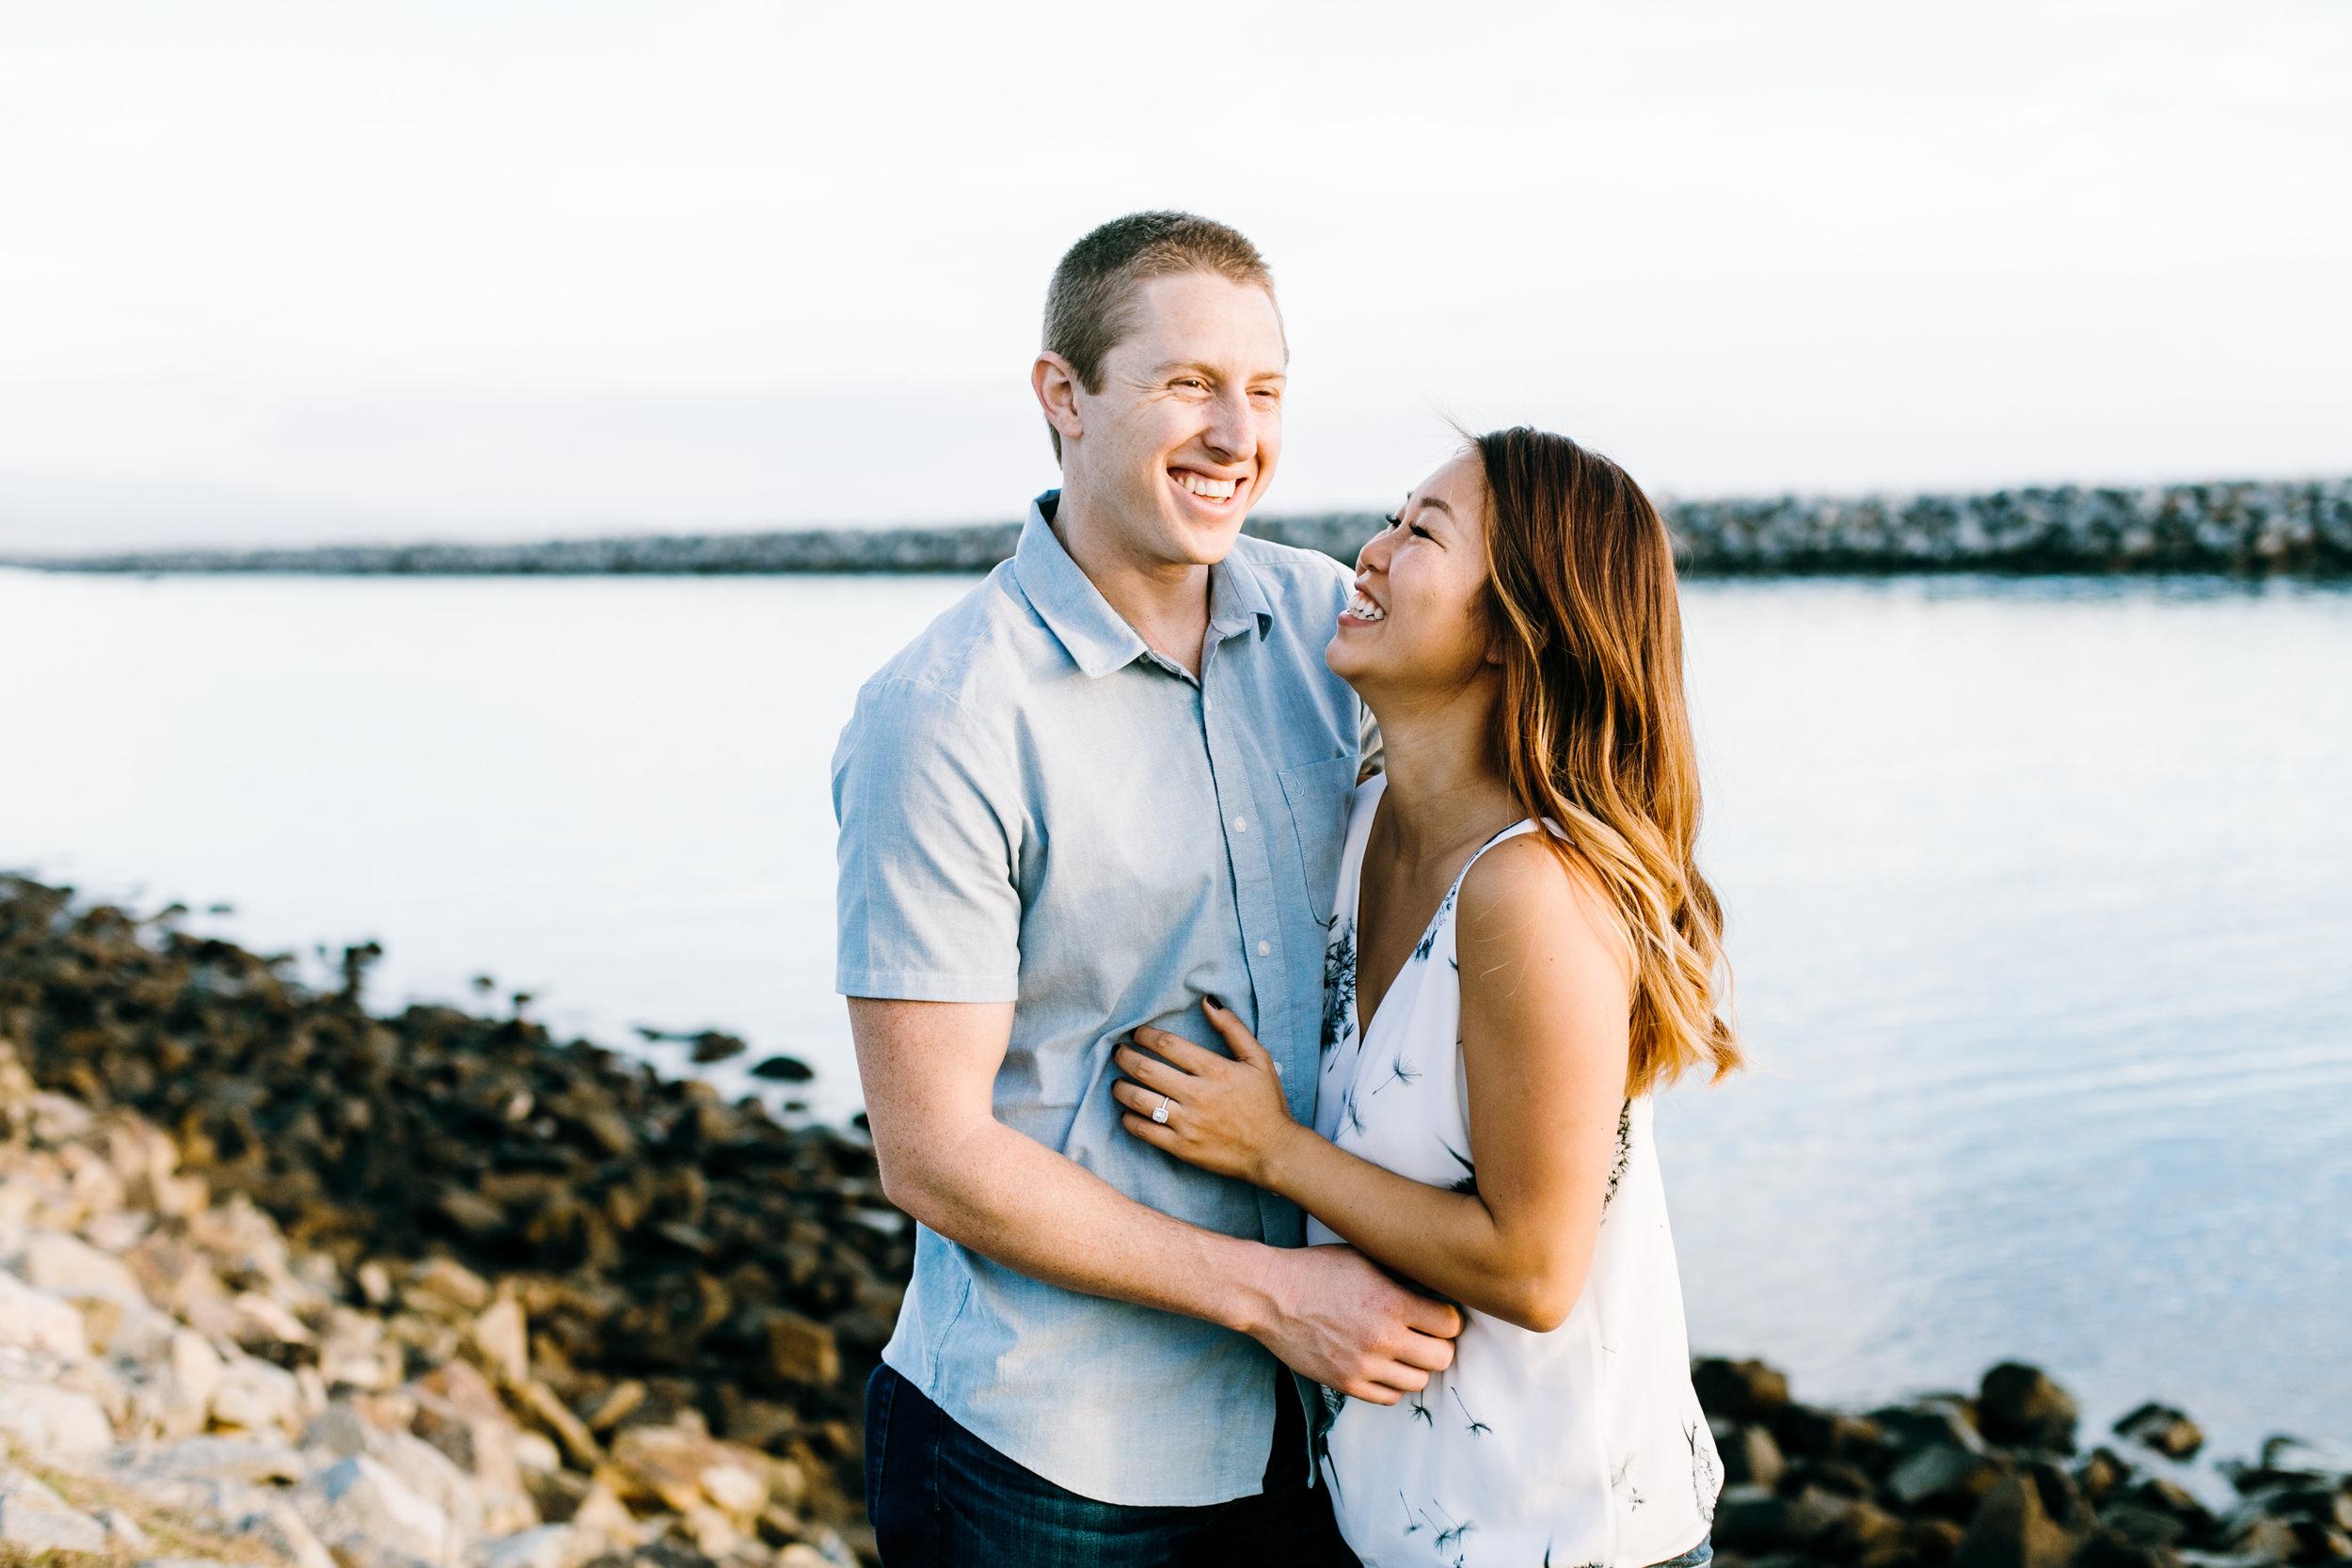 KaraNixonWeddings-DanaPoint-Engagement-15.jpg